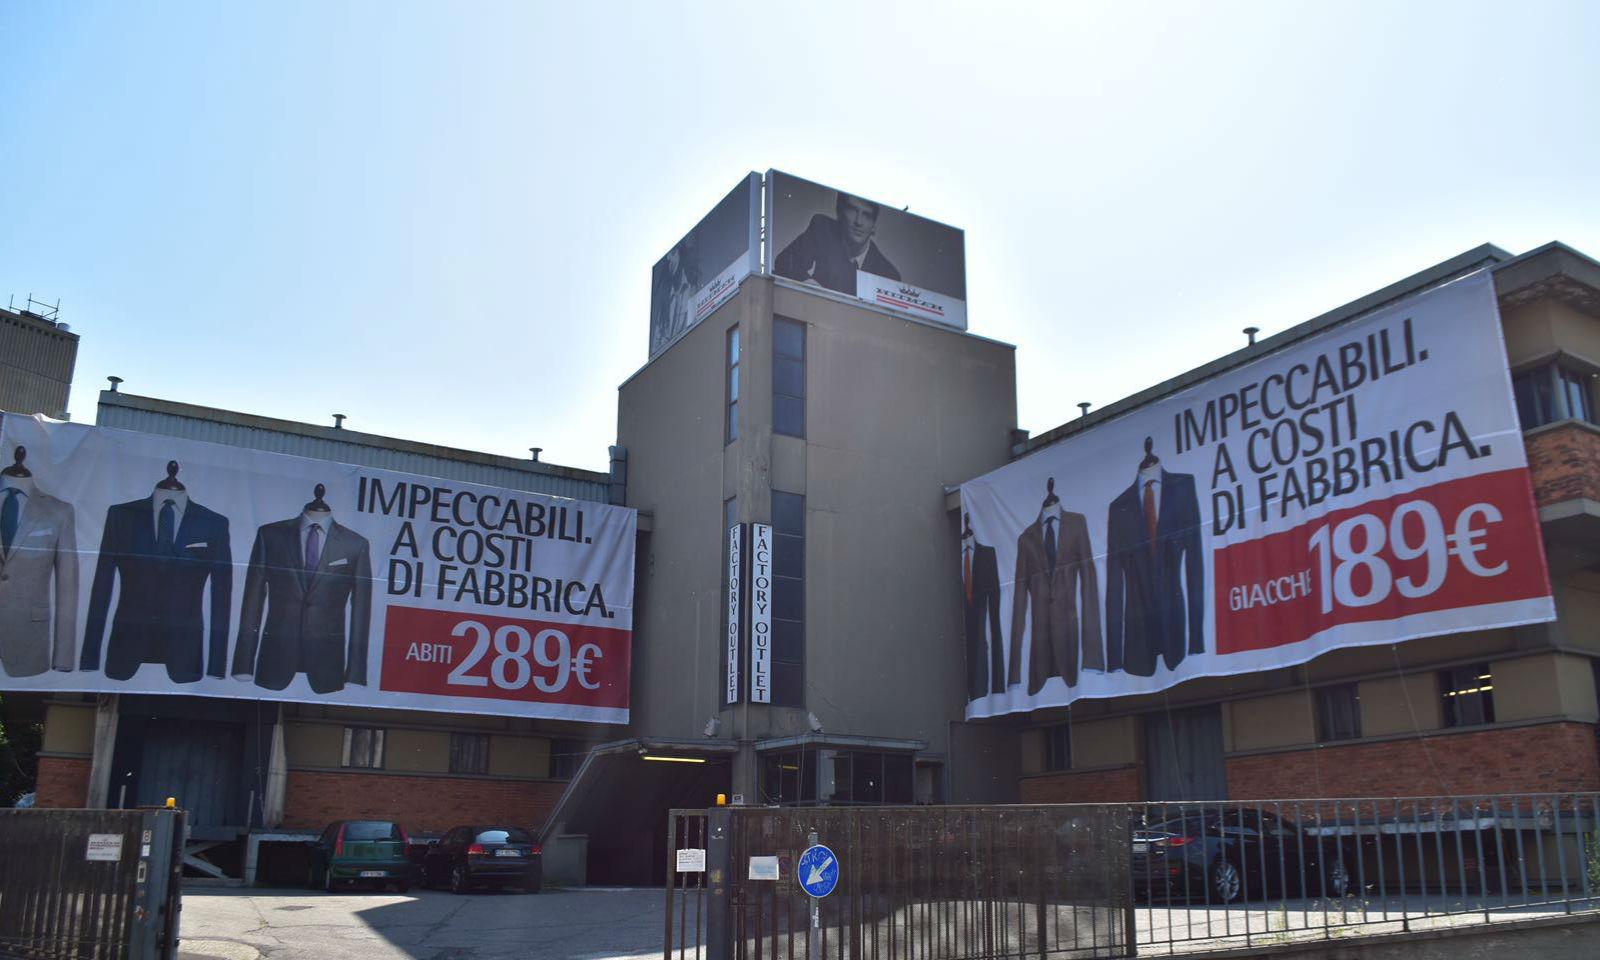 Hitman Factory Store